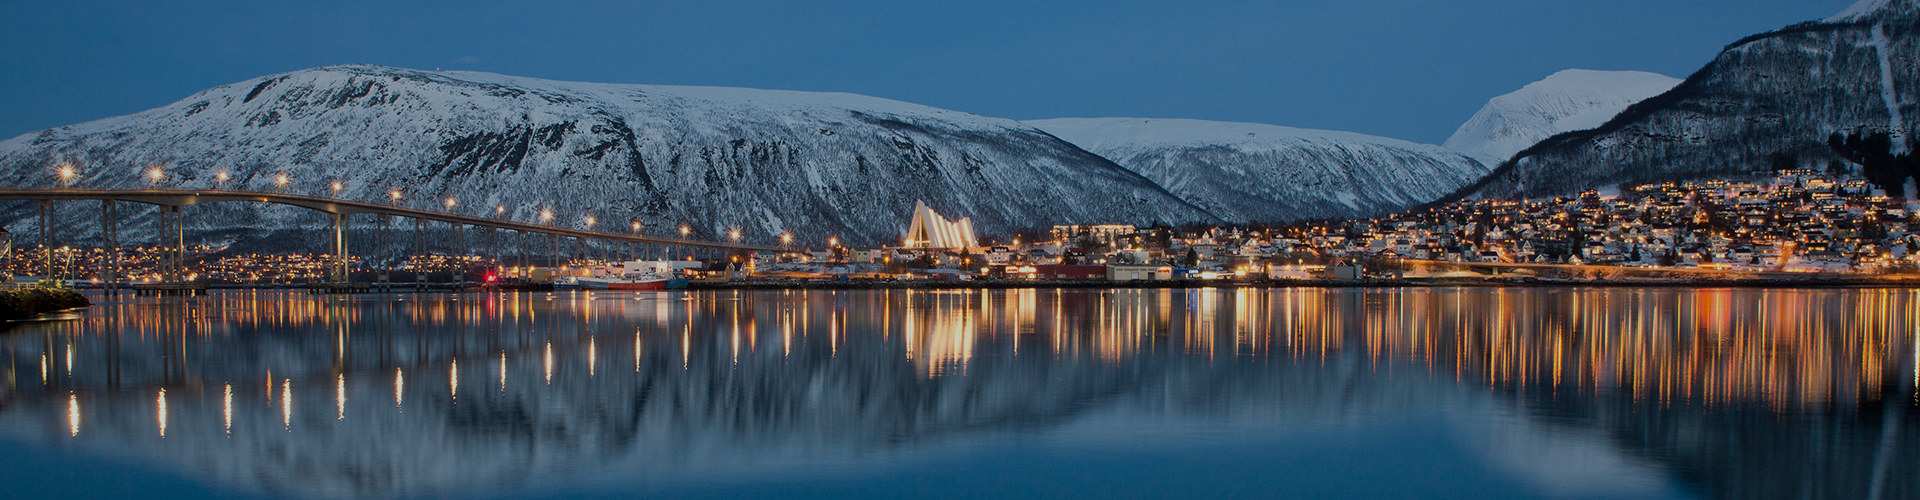 Landmark photograph of Norway